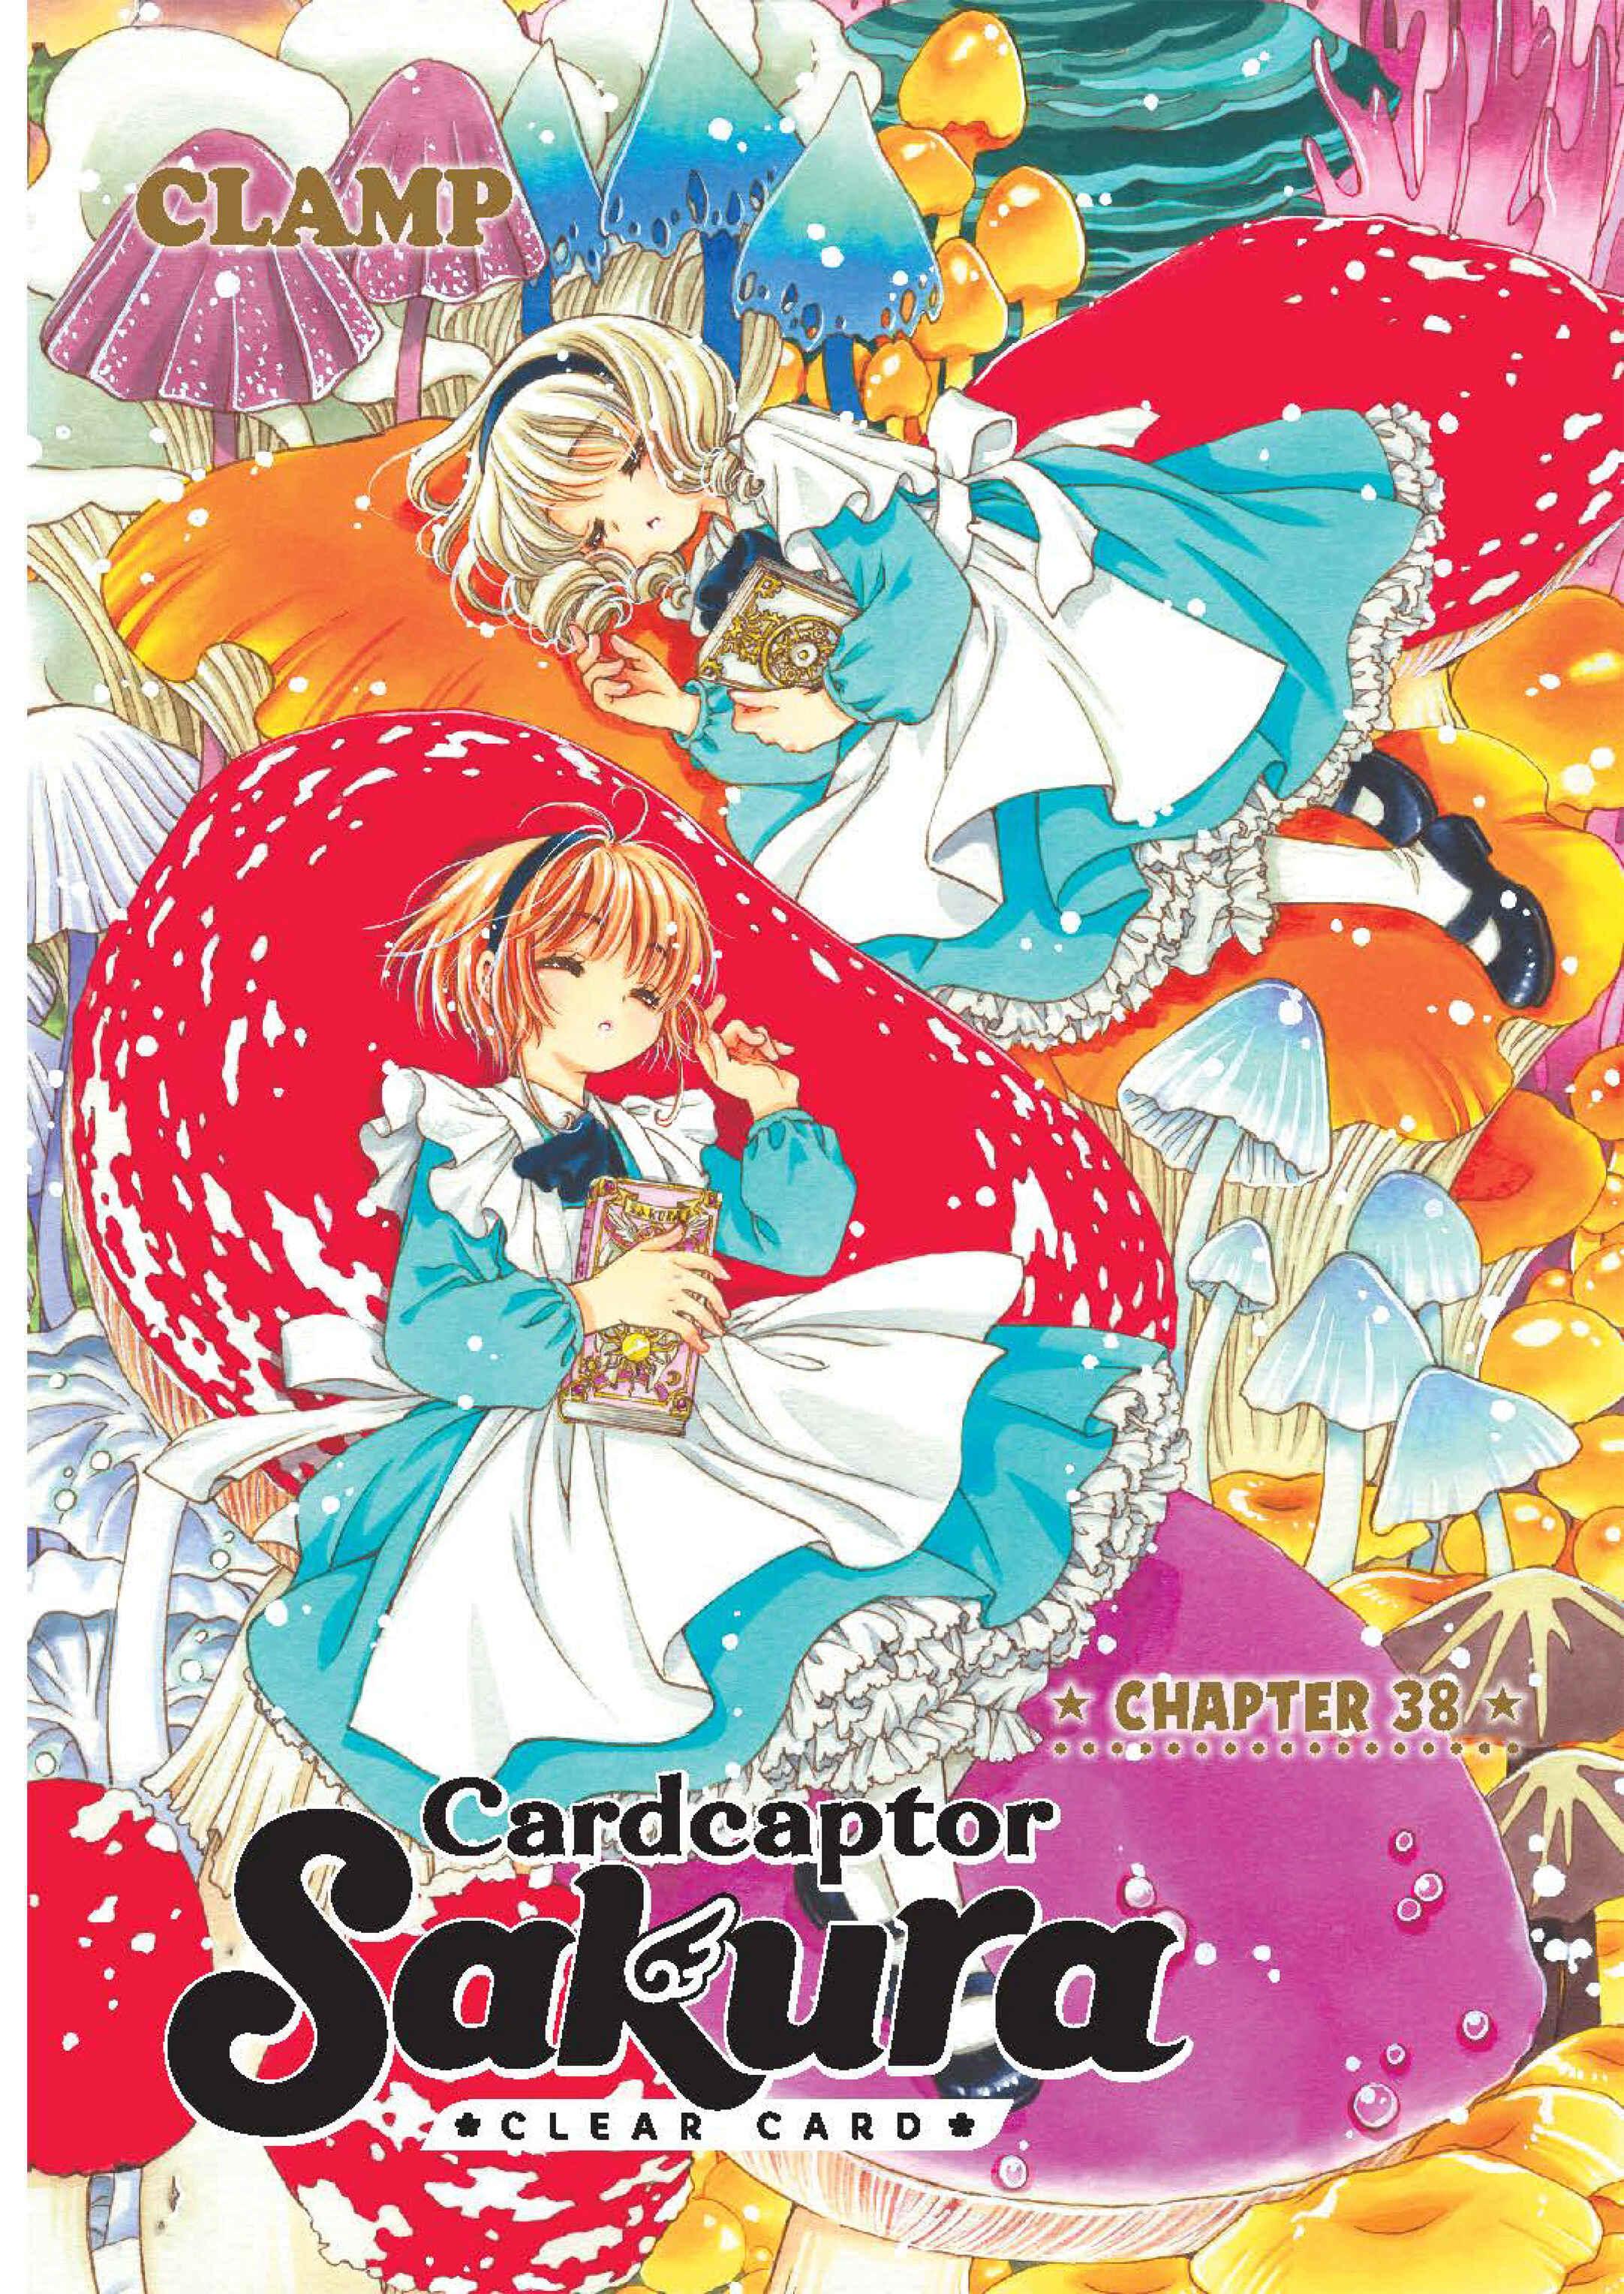 Card Captor Sakura et autres mangas [CLAMP] - Page 41 0009410